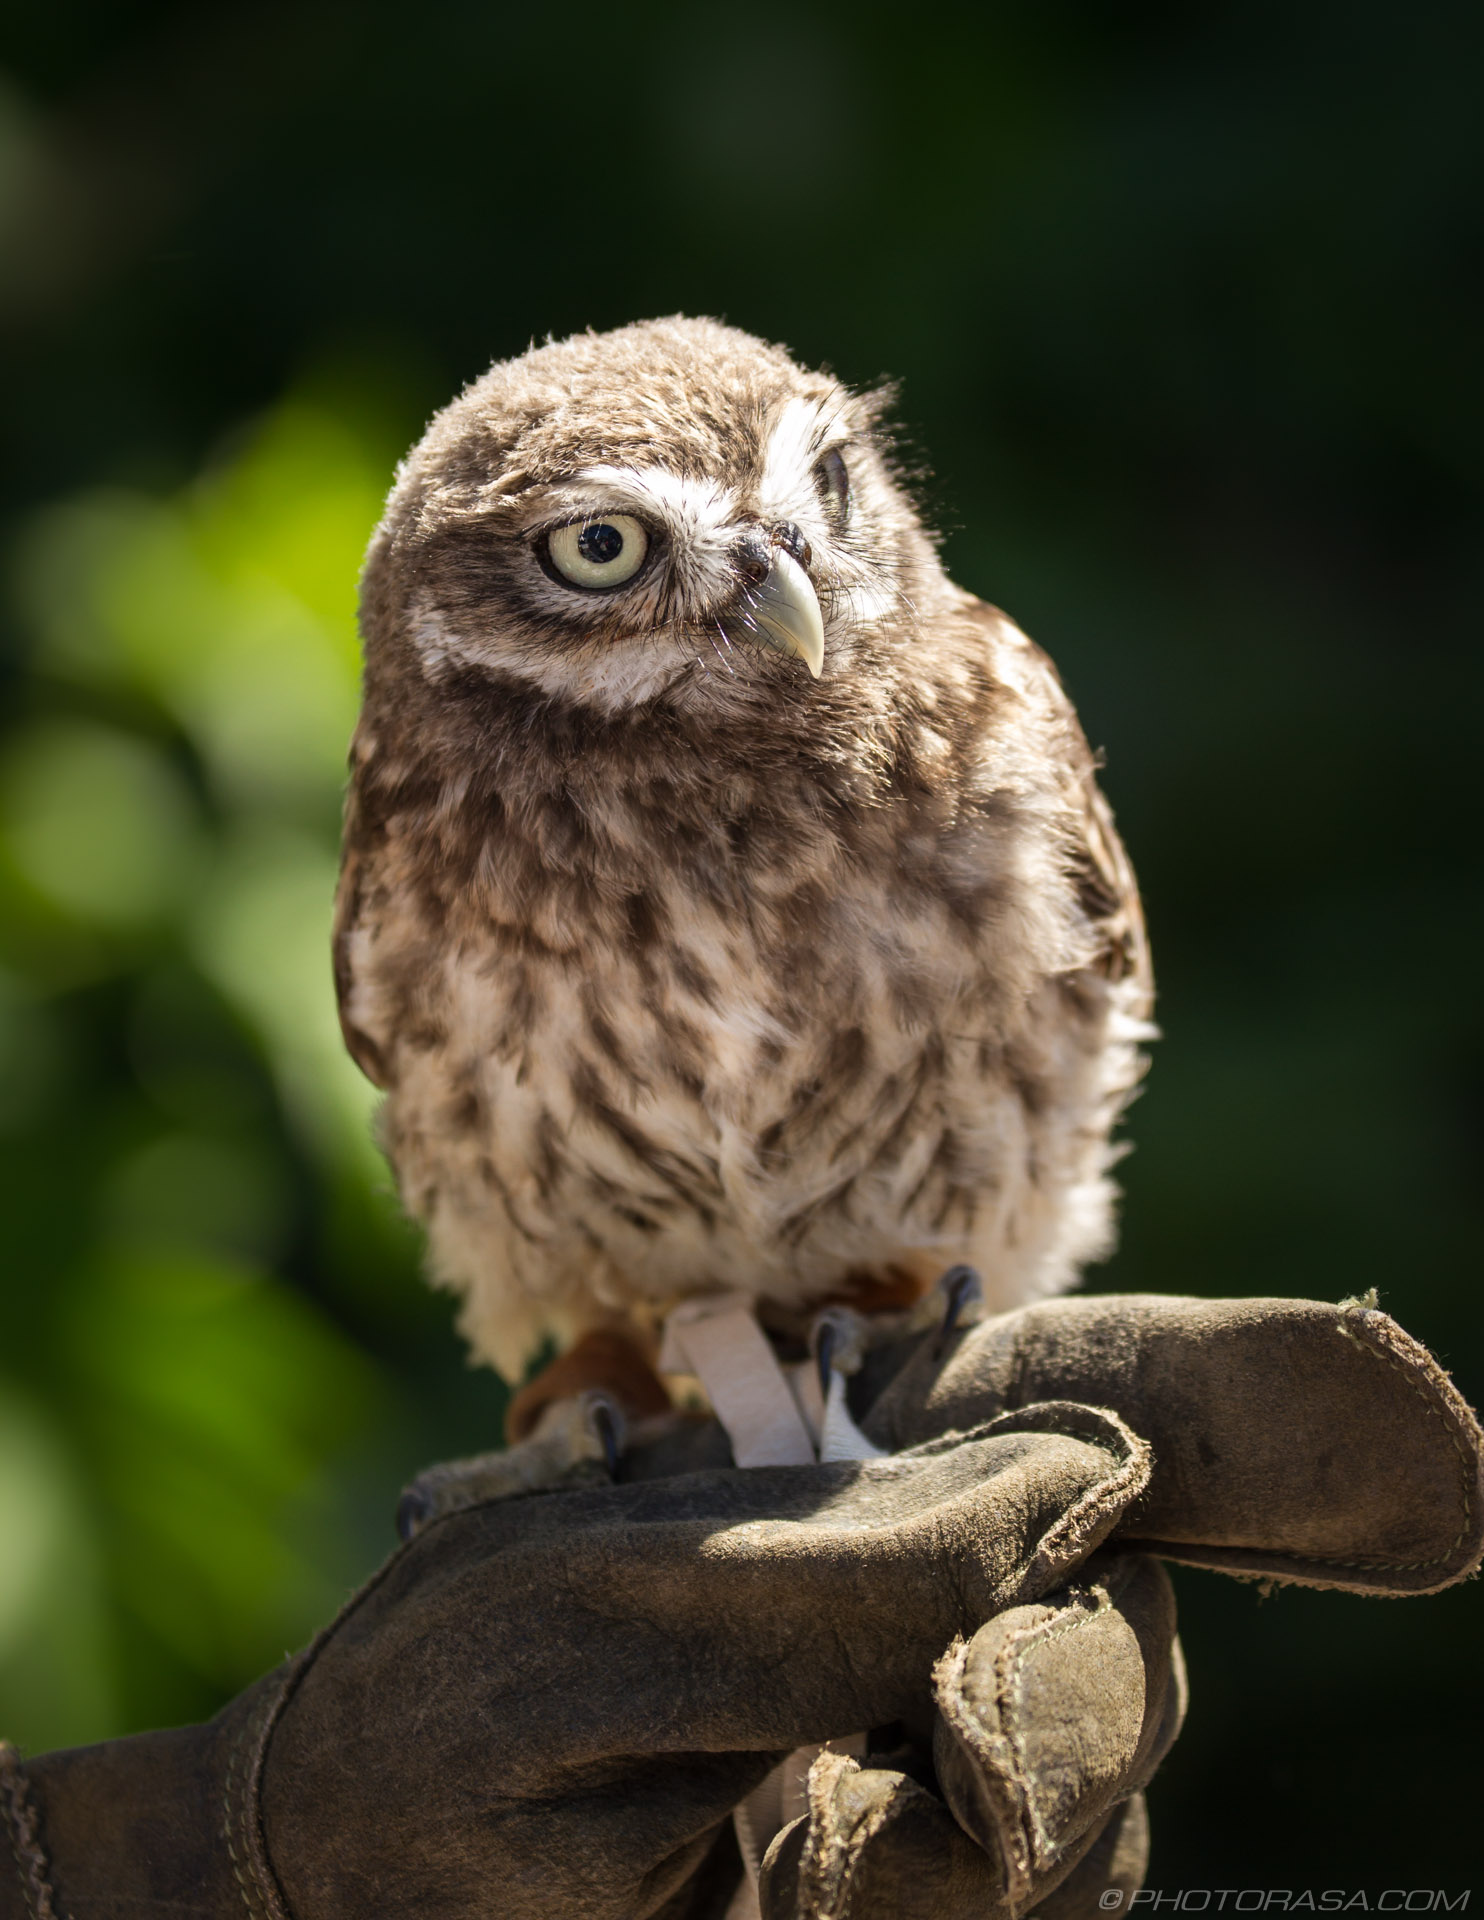 https://photorasa.com/owls/baby-owl/